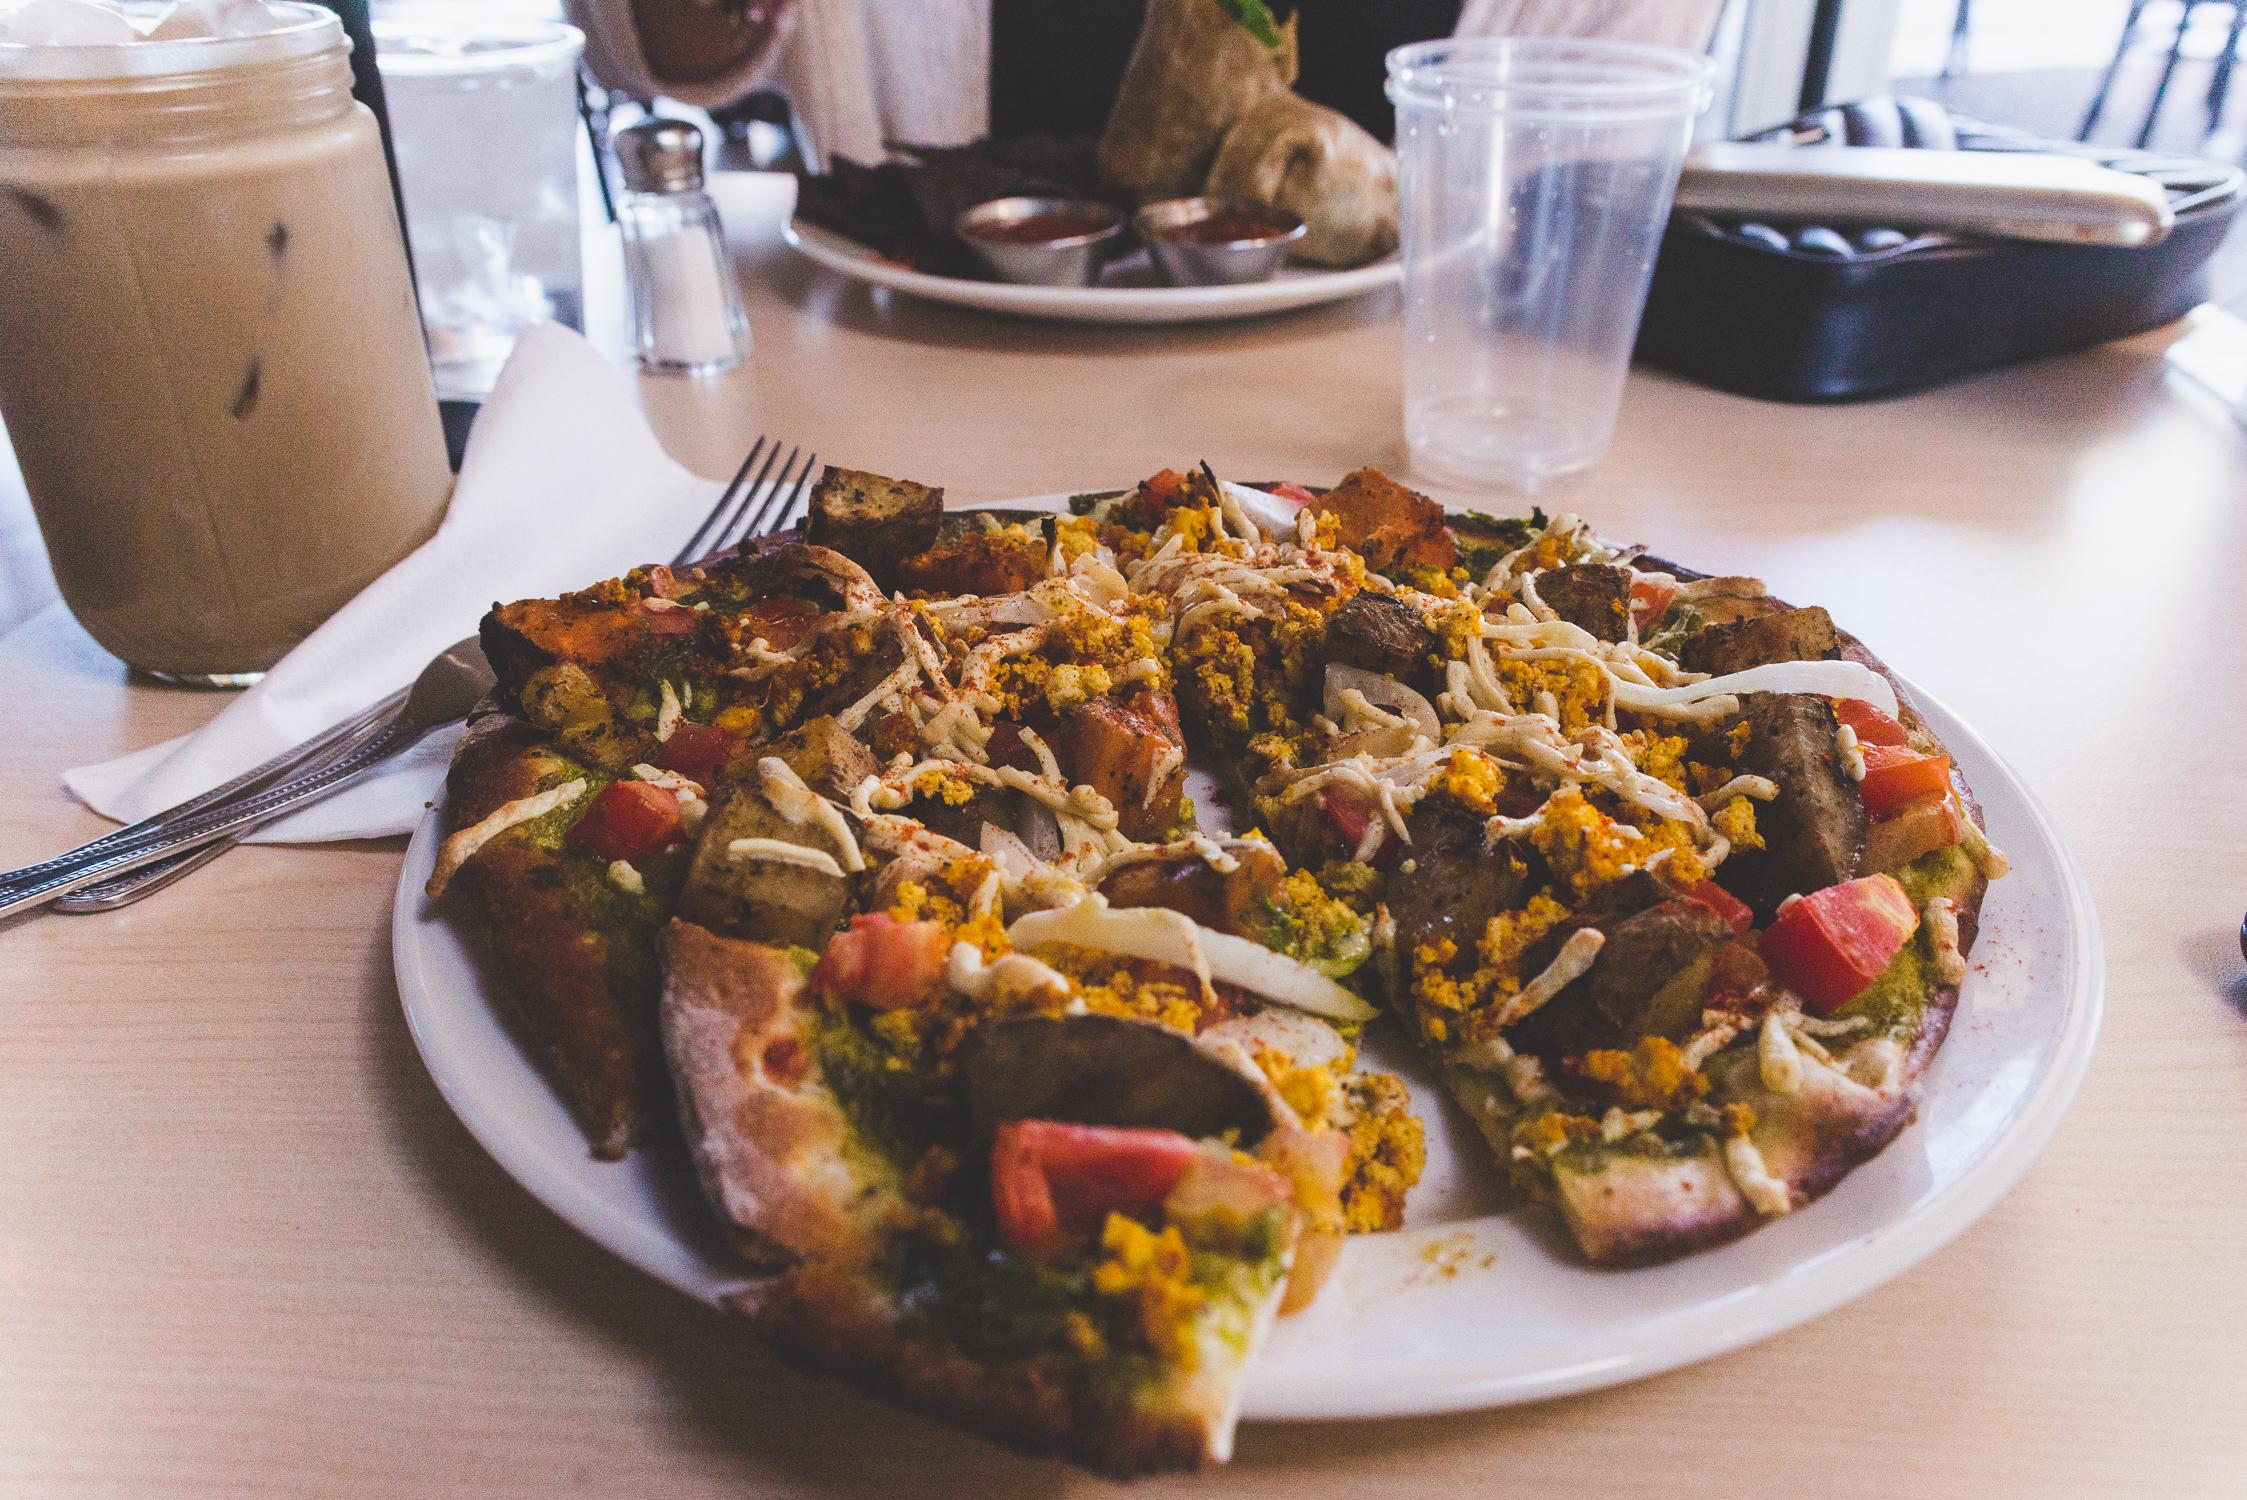 Vegan pesto breakfast pizza at The Cutting Board / 2/7/16 / Mesa, AZ